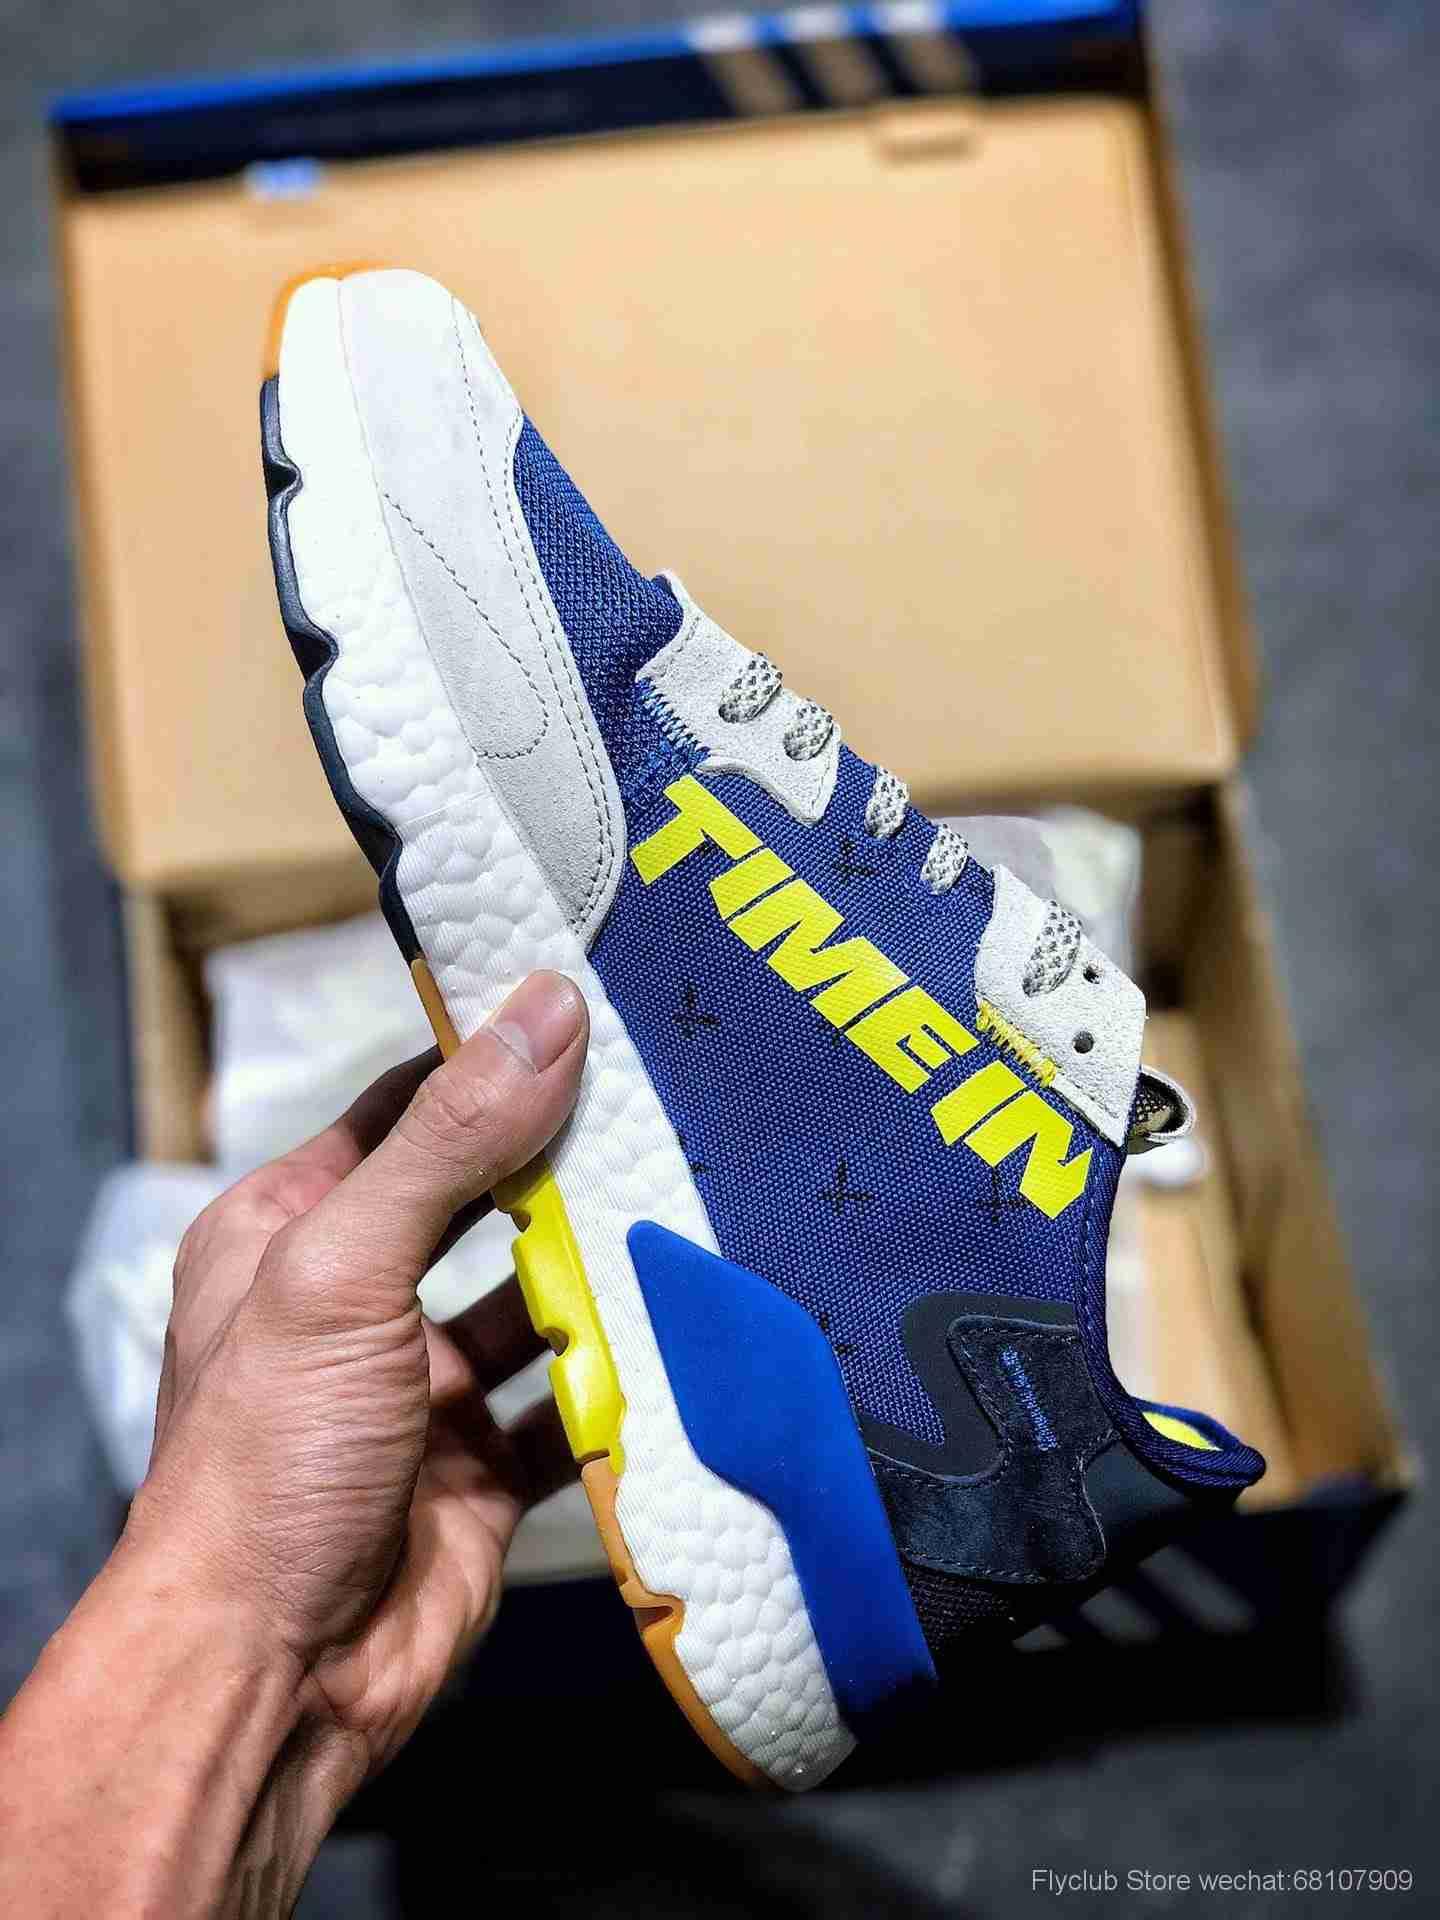 "Ninja x Adidas Originals Nite Jogger Boost""Time In""跑鞋""米灰夜蓝黄3M""FV6404"